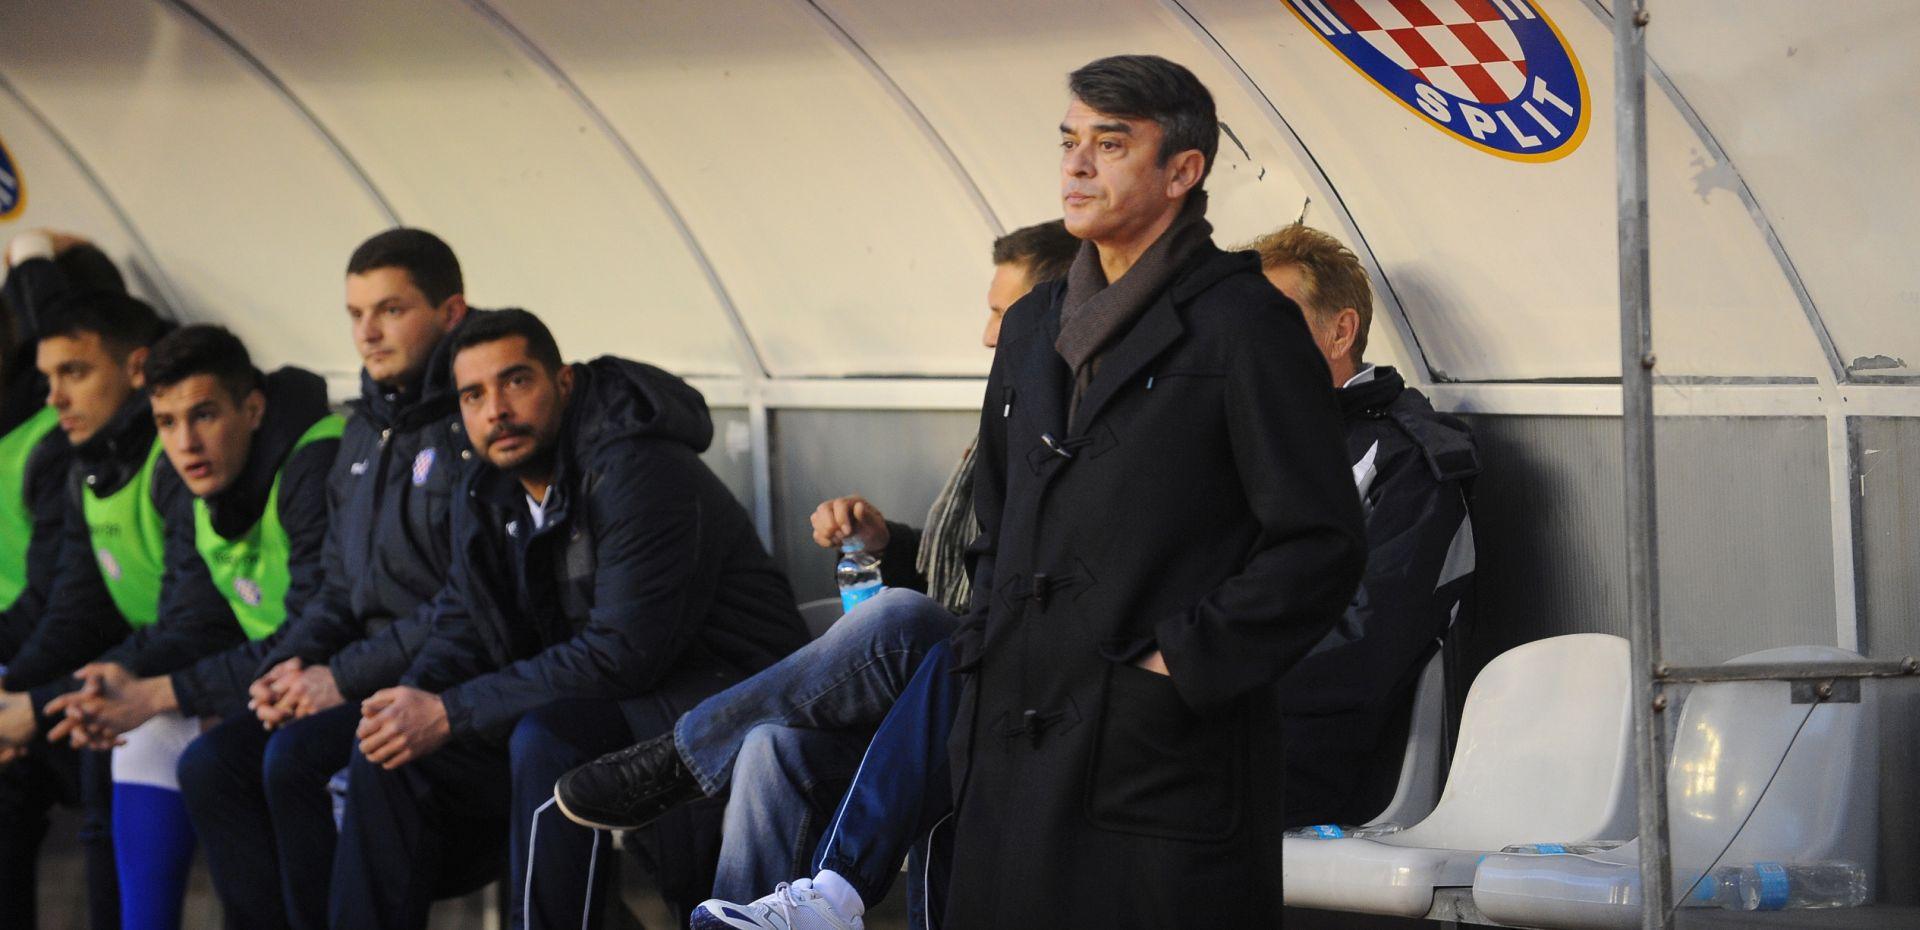 Trener Burić: Šokiran sam događanjima u Hajduku